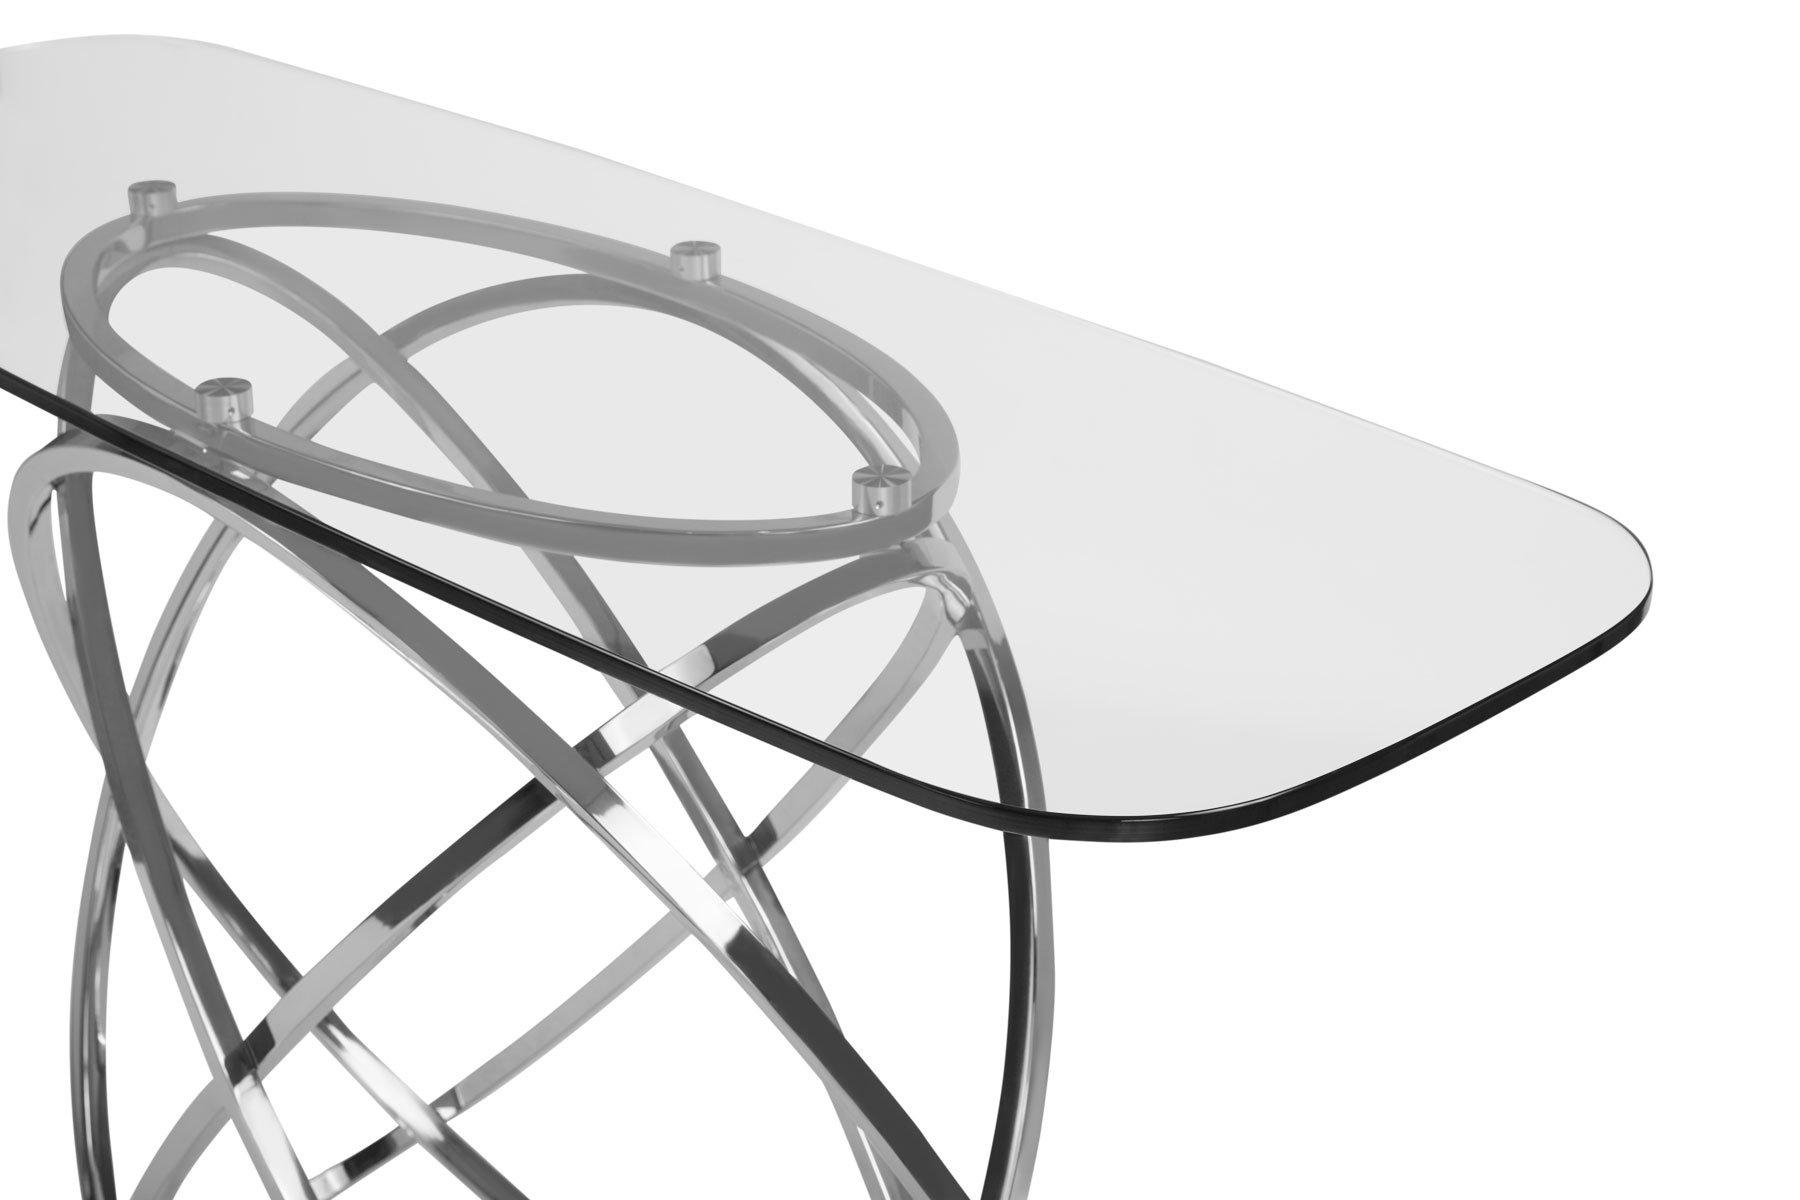 CATALANO-SKU-MHE351400-TOKYO-SOFA-TABLE-ST-STEEL-GLASS52016-copy